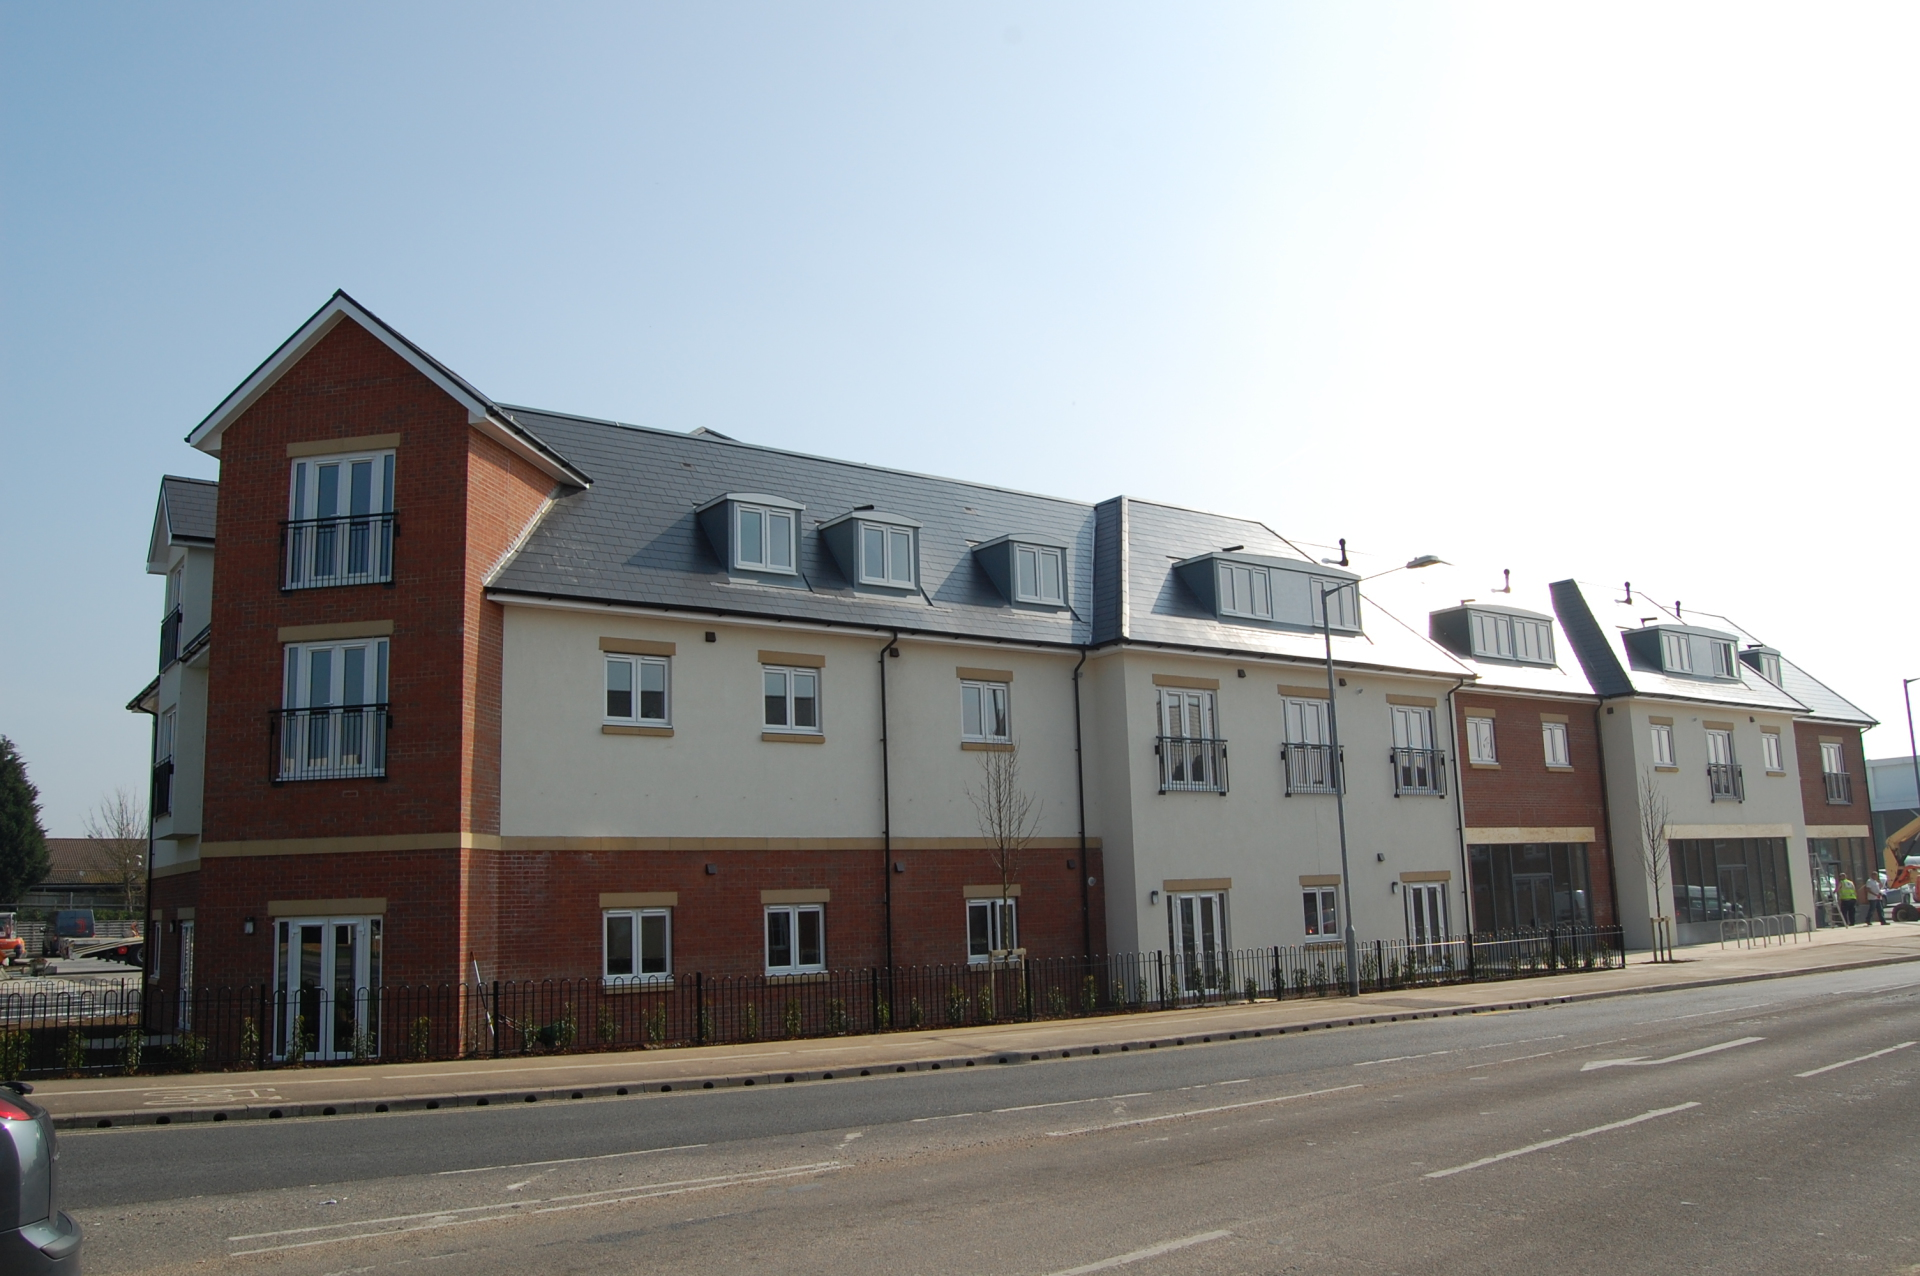 Rayleigh Mixed Use Development - Essex